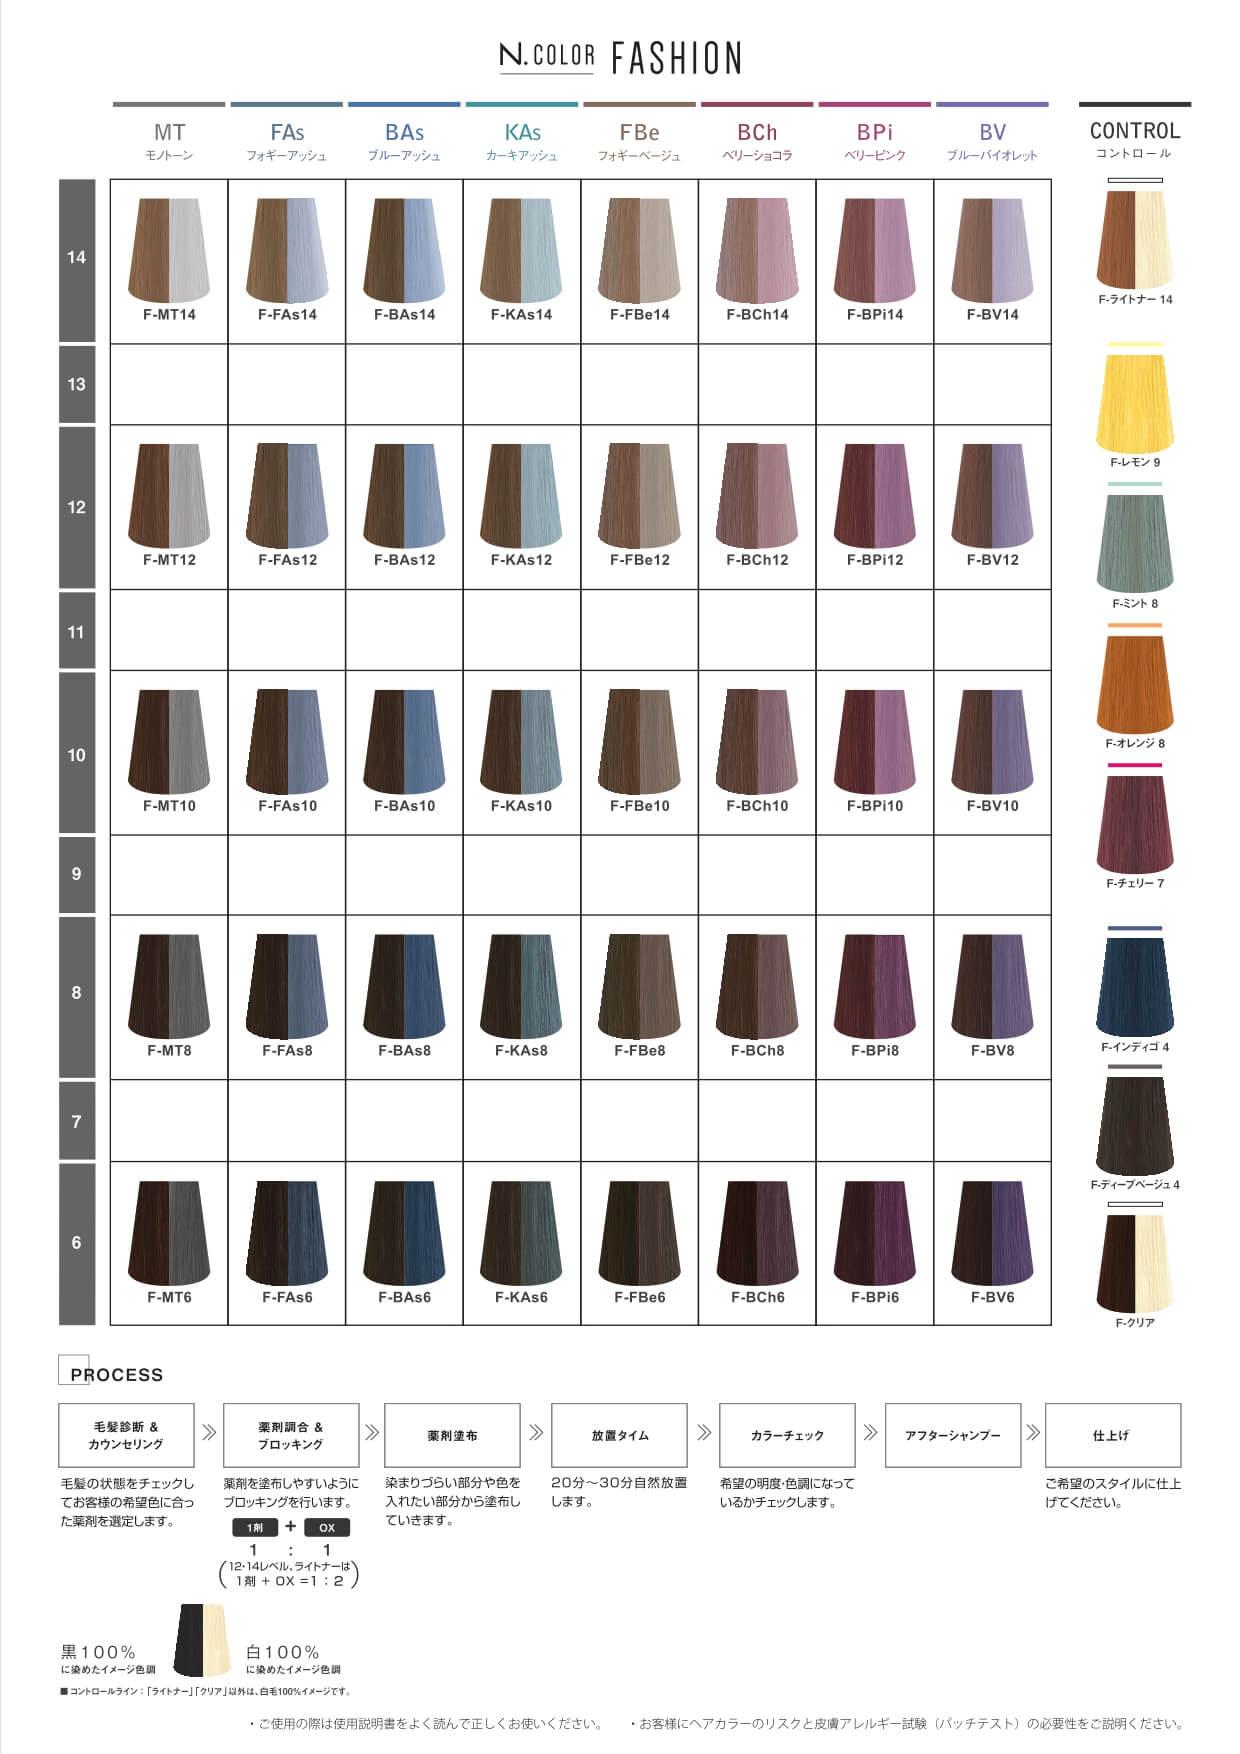 N.color-chart-fashon